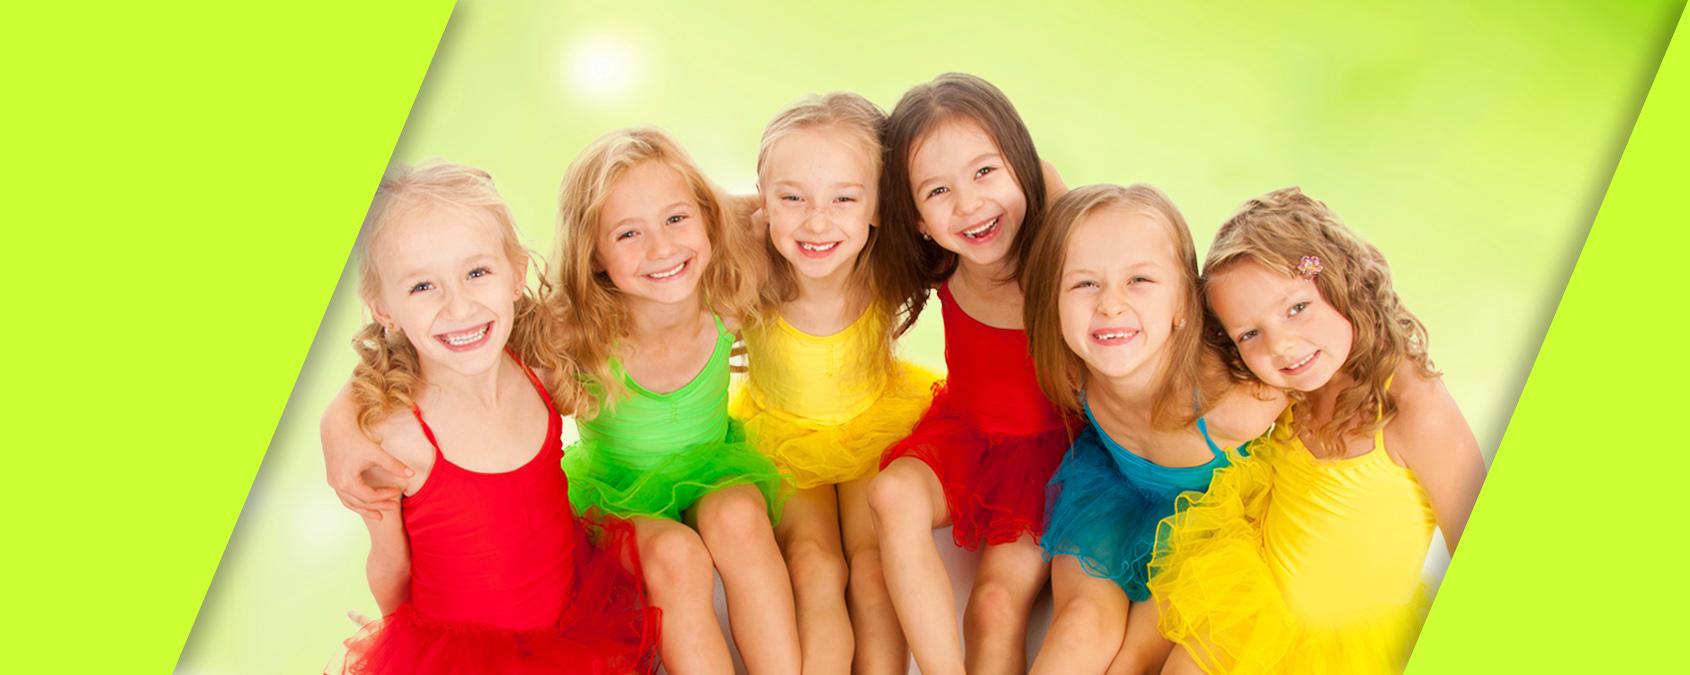 ADTV Tanzschule Wangler - Hompage Slider 3